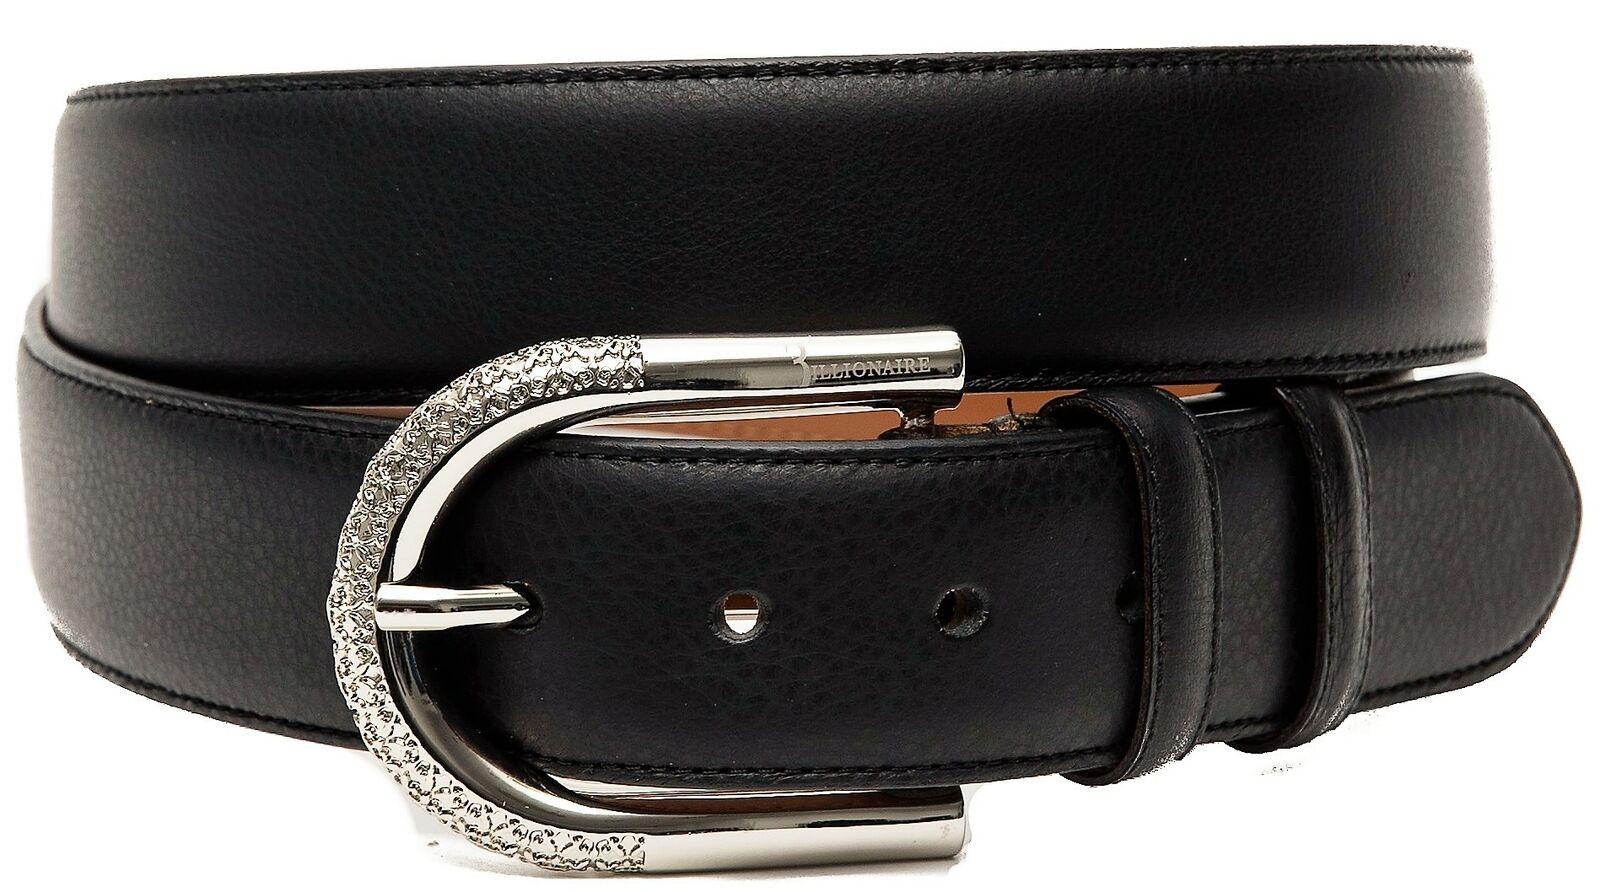 Damengürtel Leder Schwarz BILLIONAIRE Gürtel Frau Black Leather BLC71006039